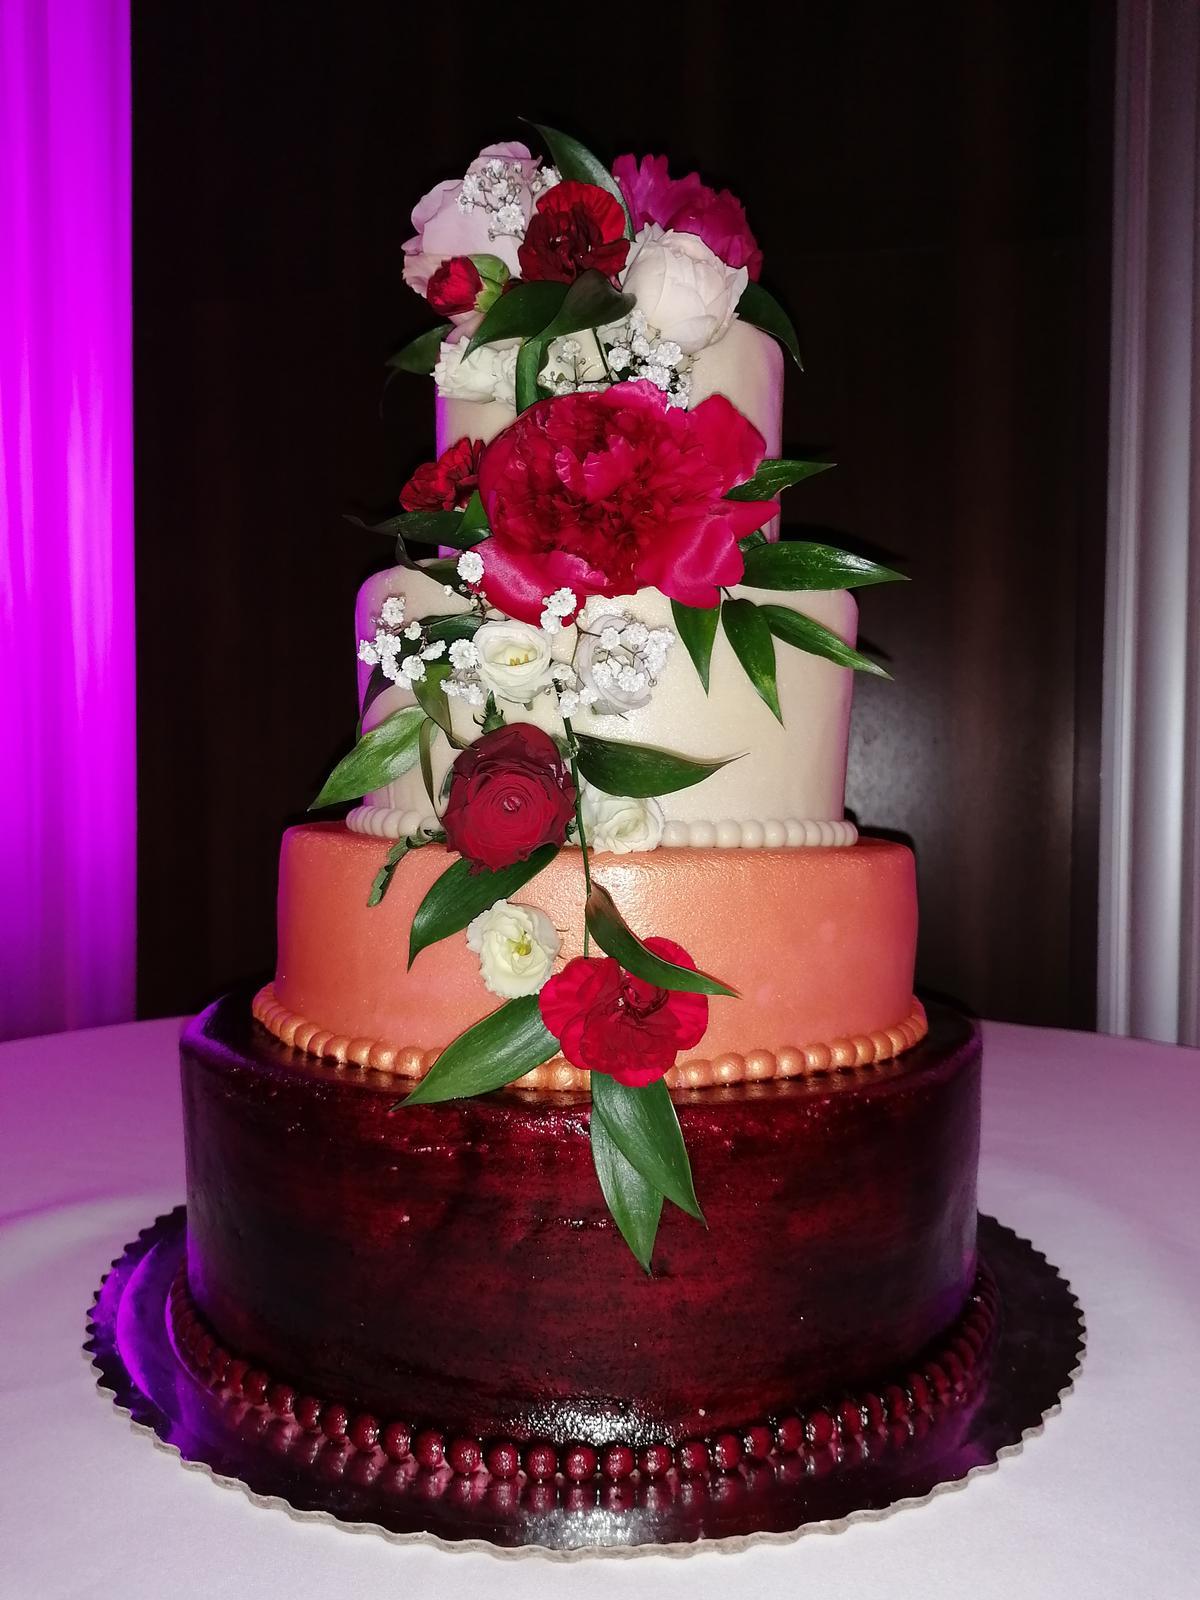 Svadobné torty - Obrázok č. 2